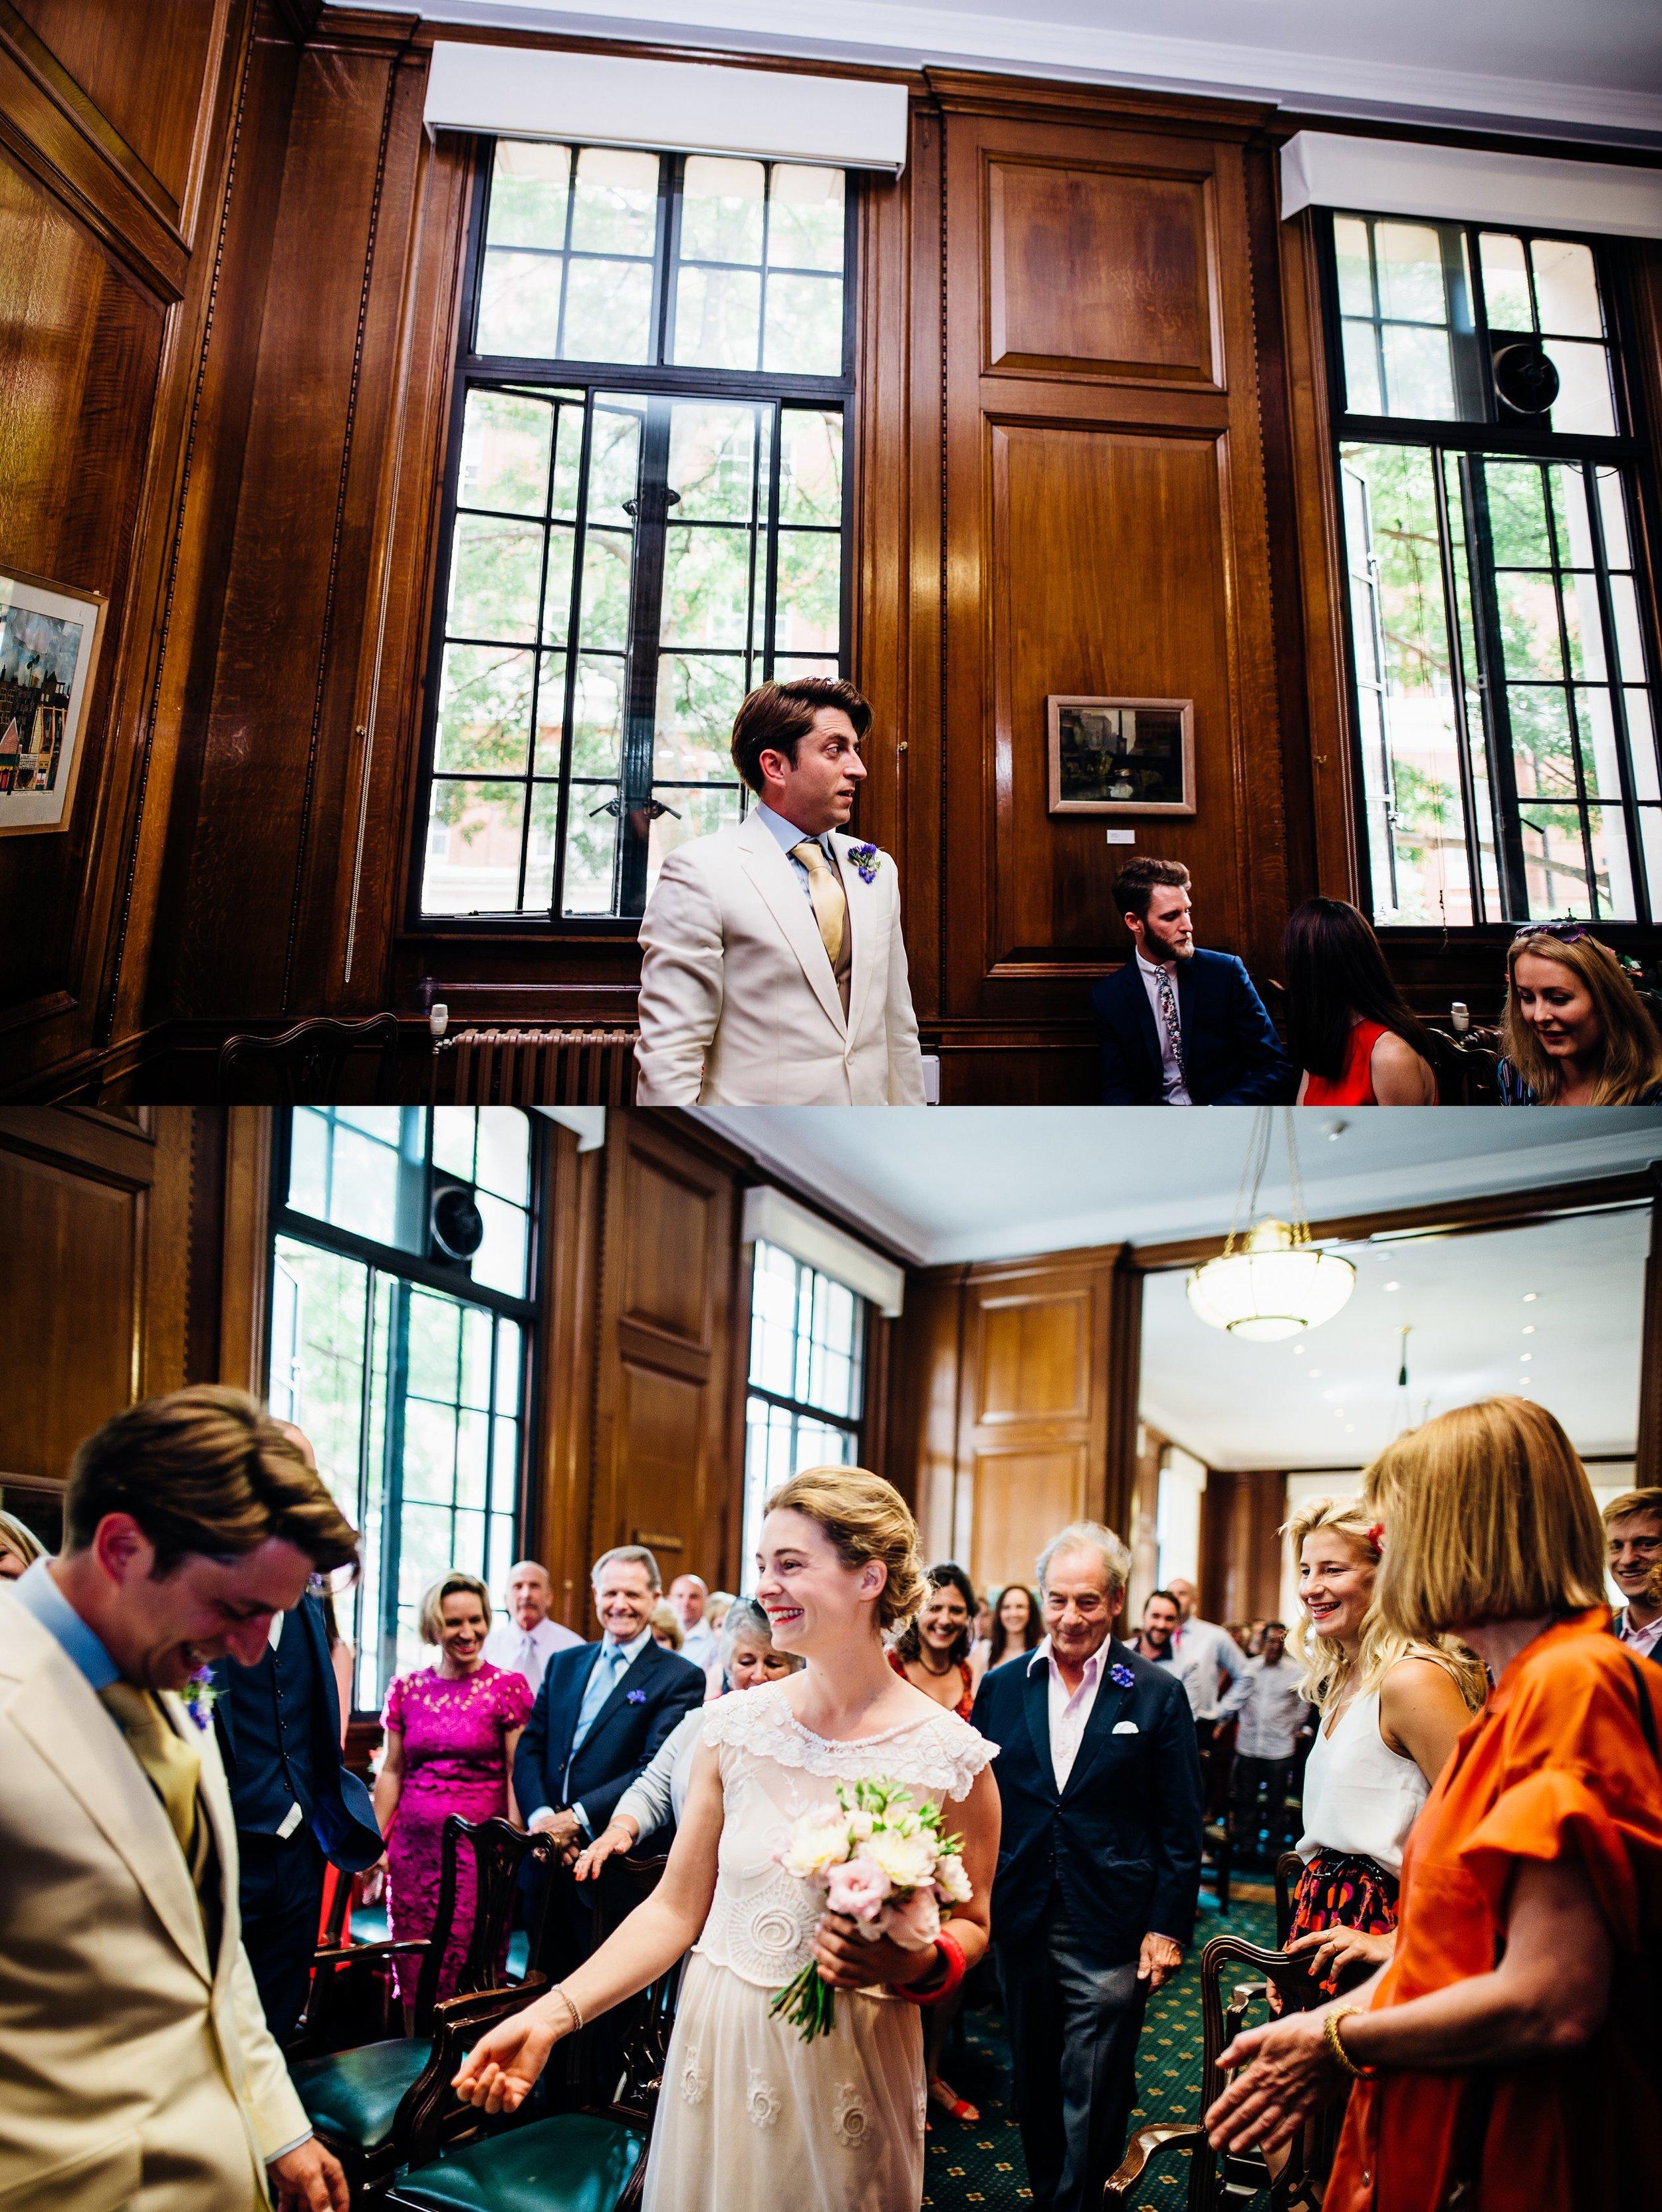 Camden Town Hall and The Prince Albert Pub wedding_0003.jpg